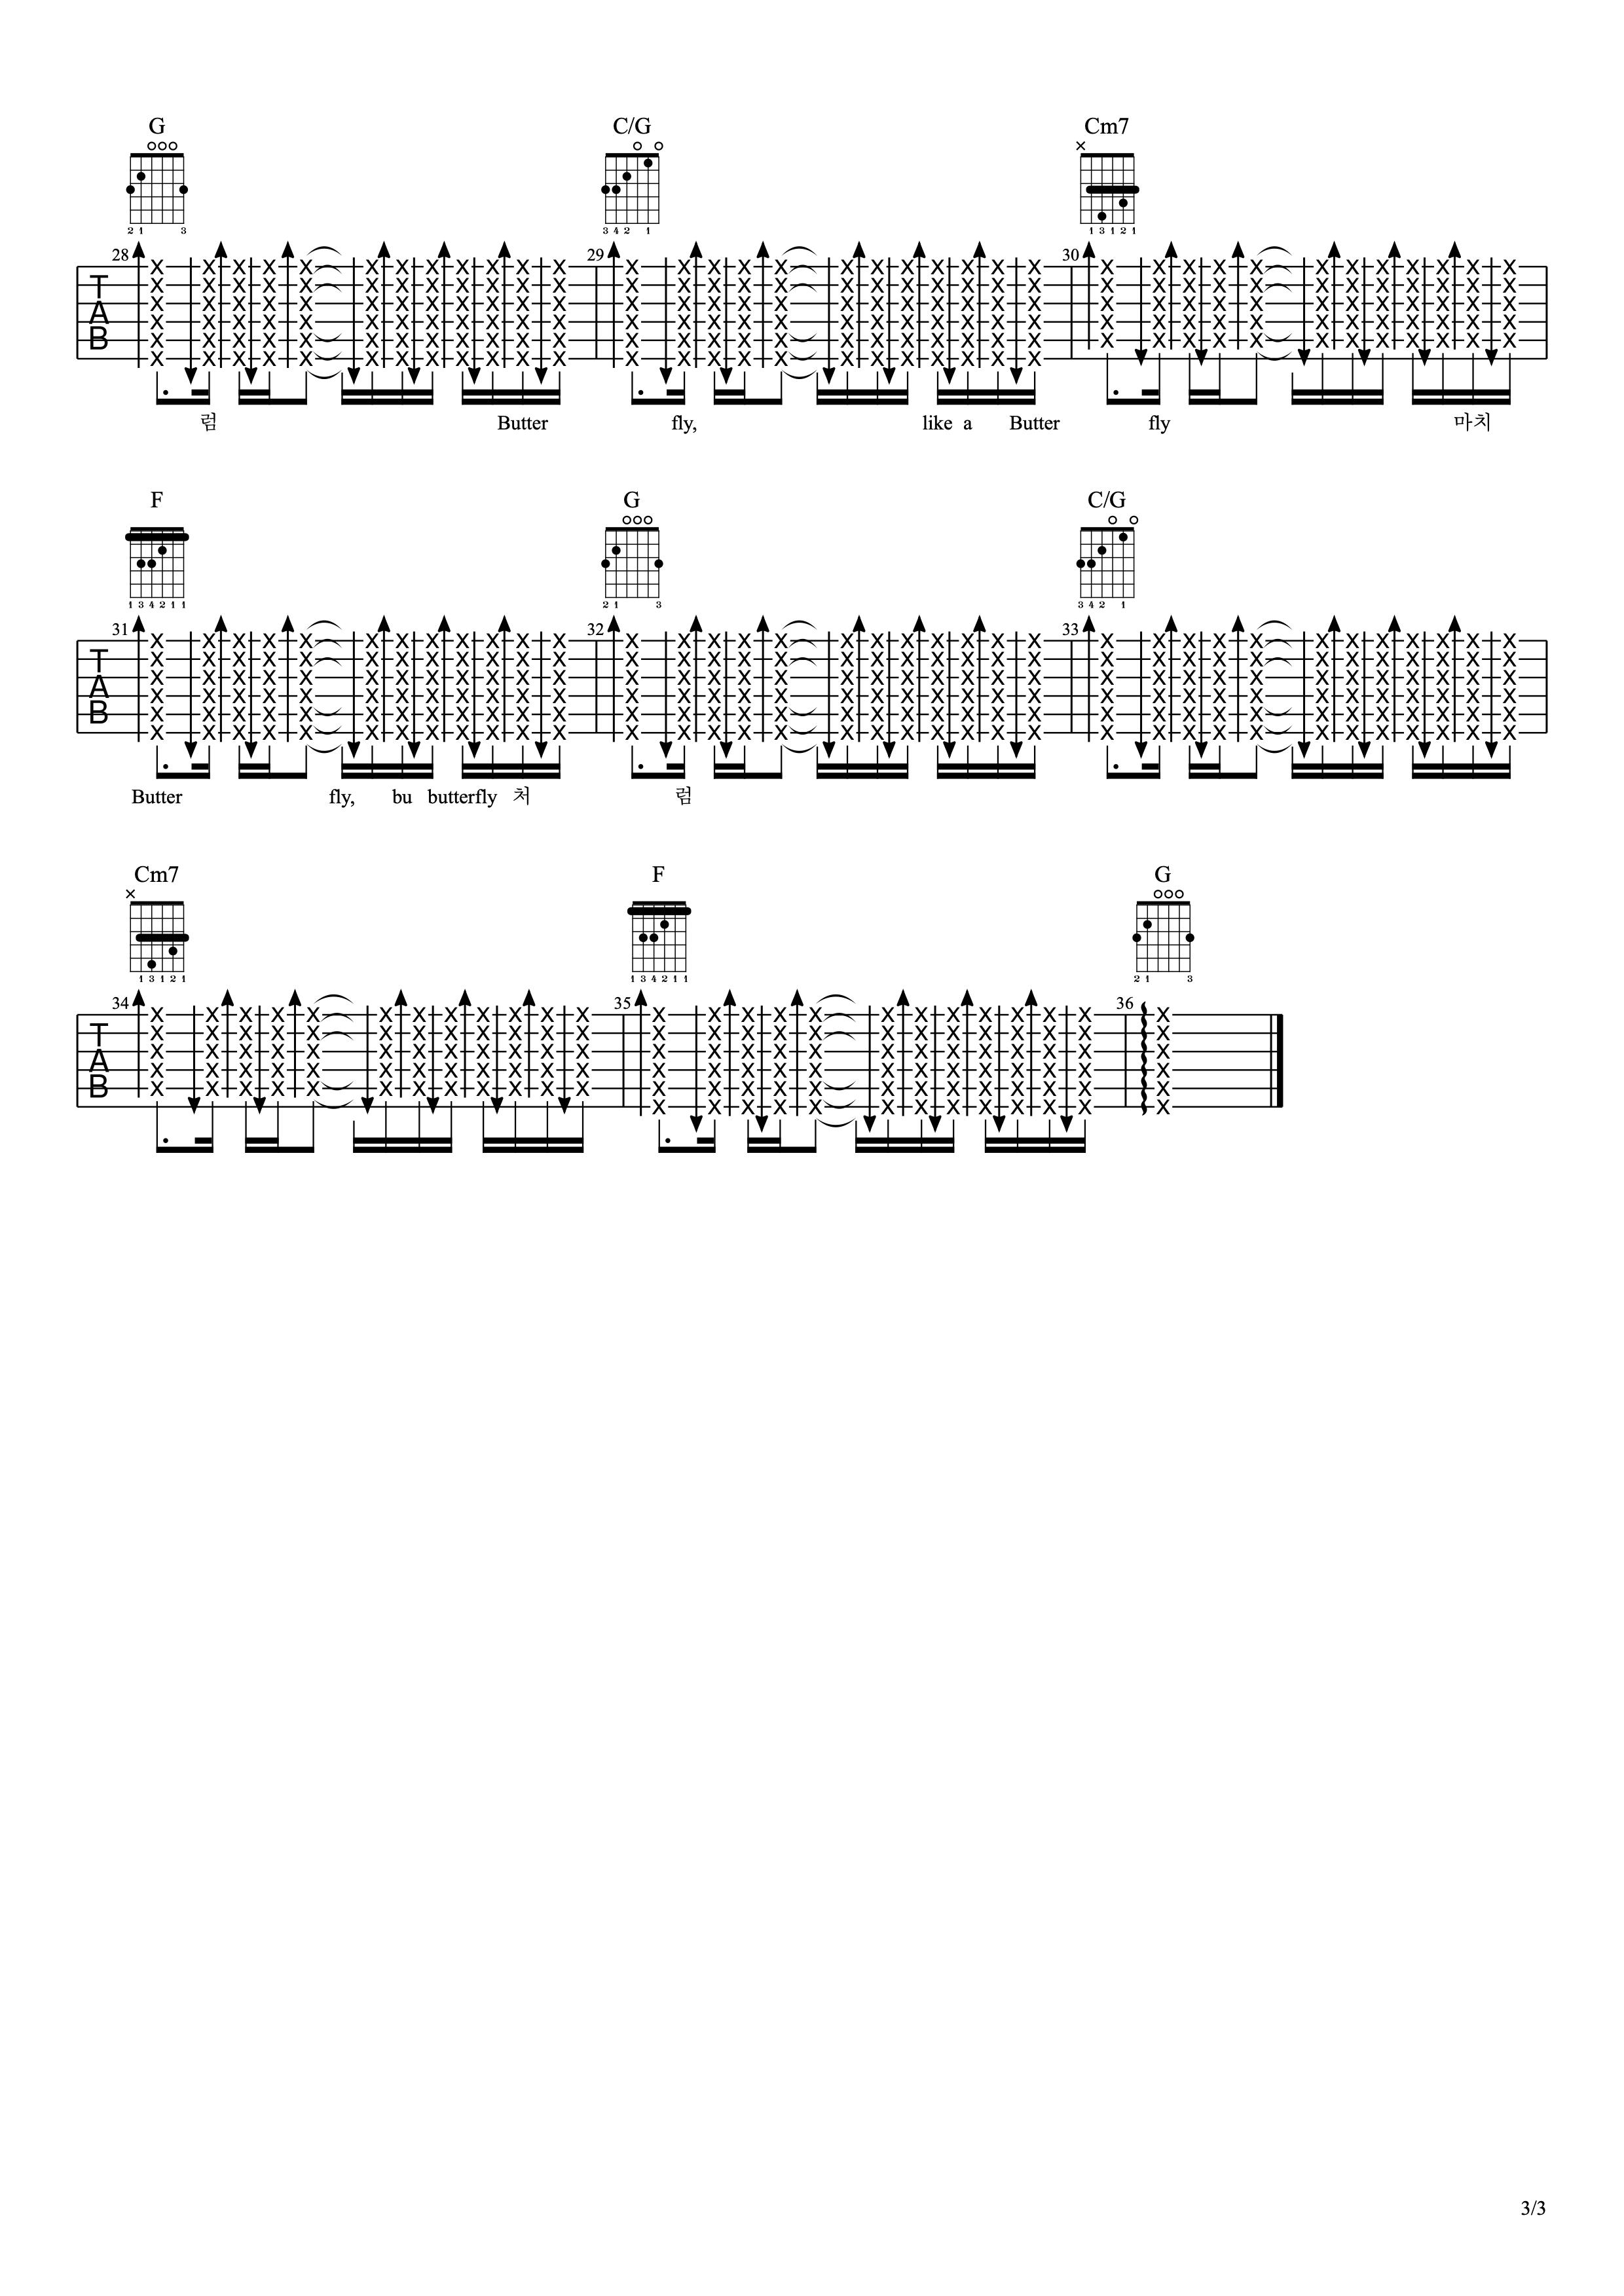 Butterfly 吉他谱-防弹少年团-C大调音乐网